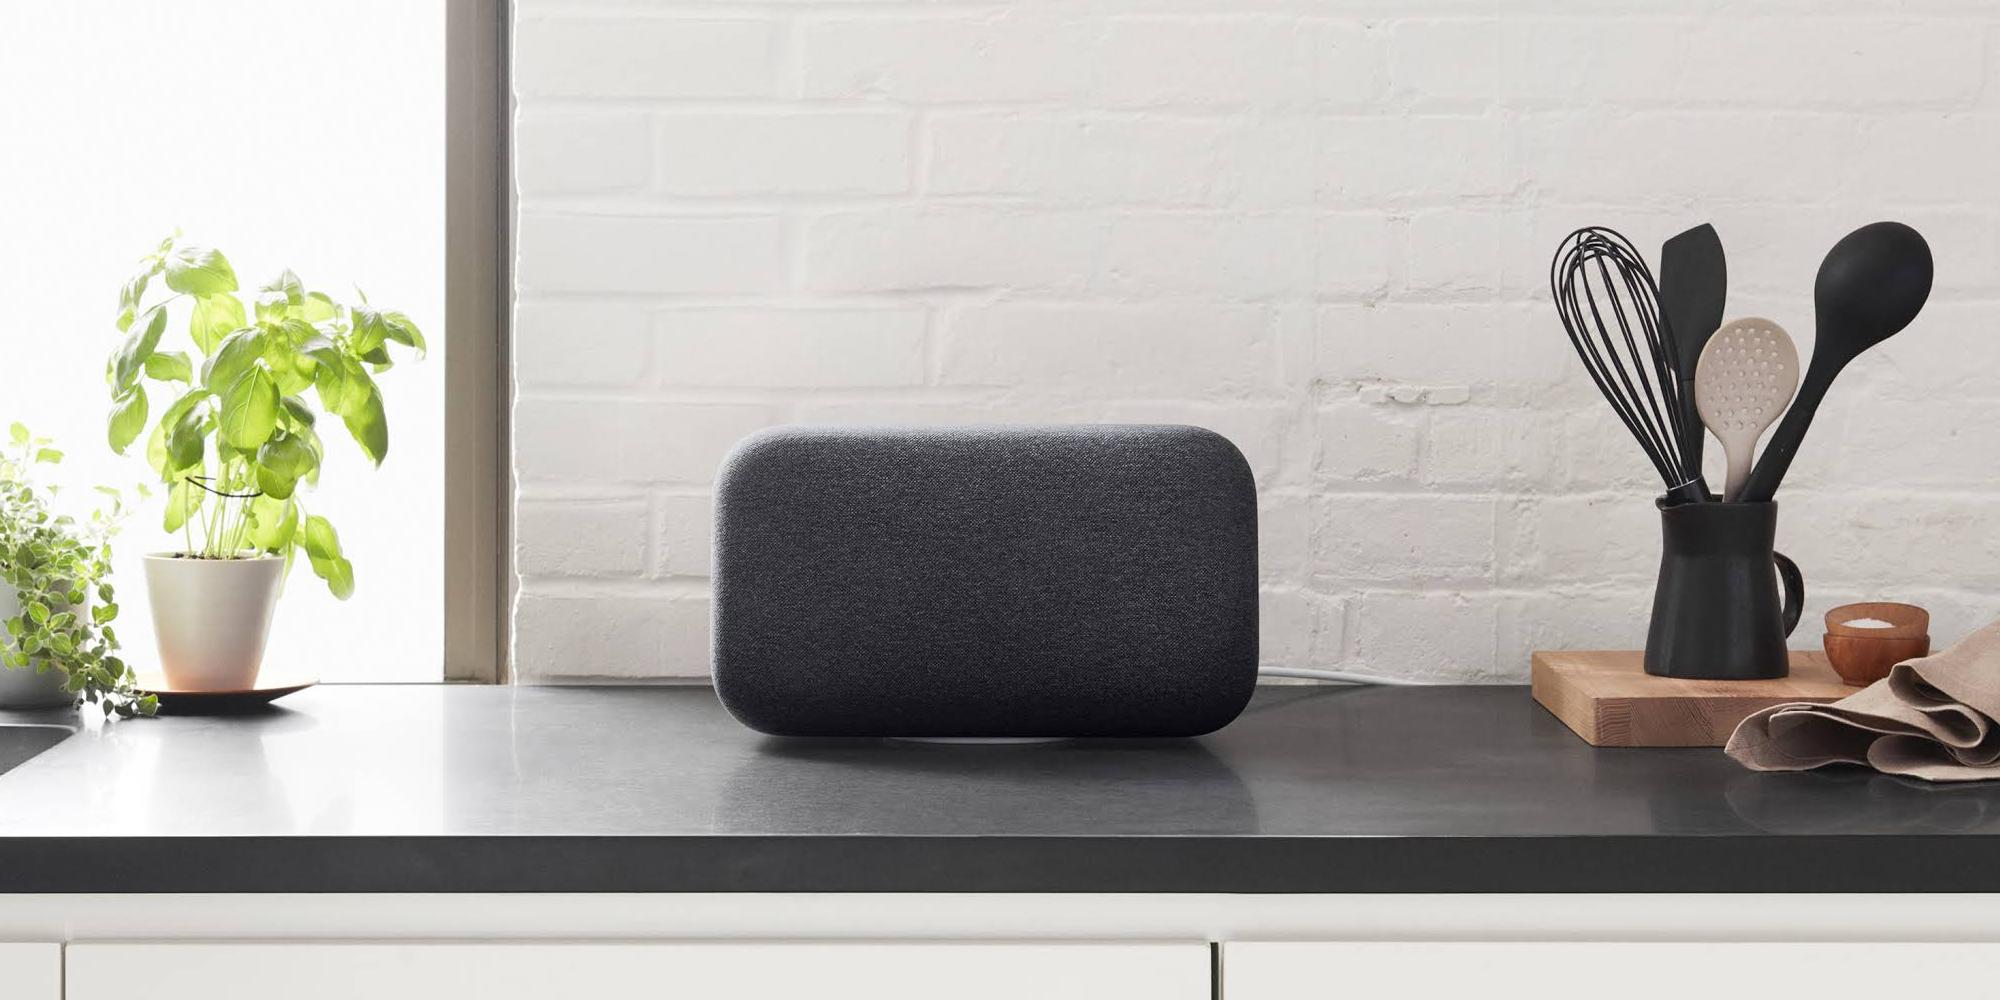 Google Home Max kostet 254 US-Dollar, Moto G6 Play kostet 150 US-Dollar, plus Angebote am frühen Prime Day